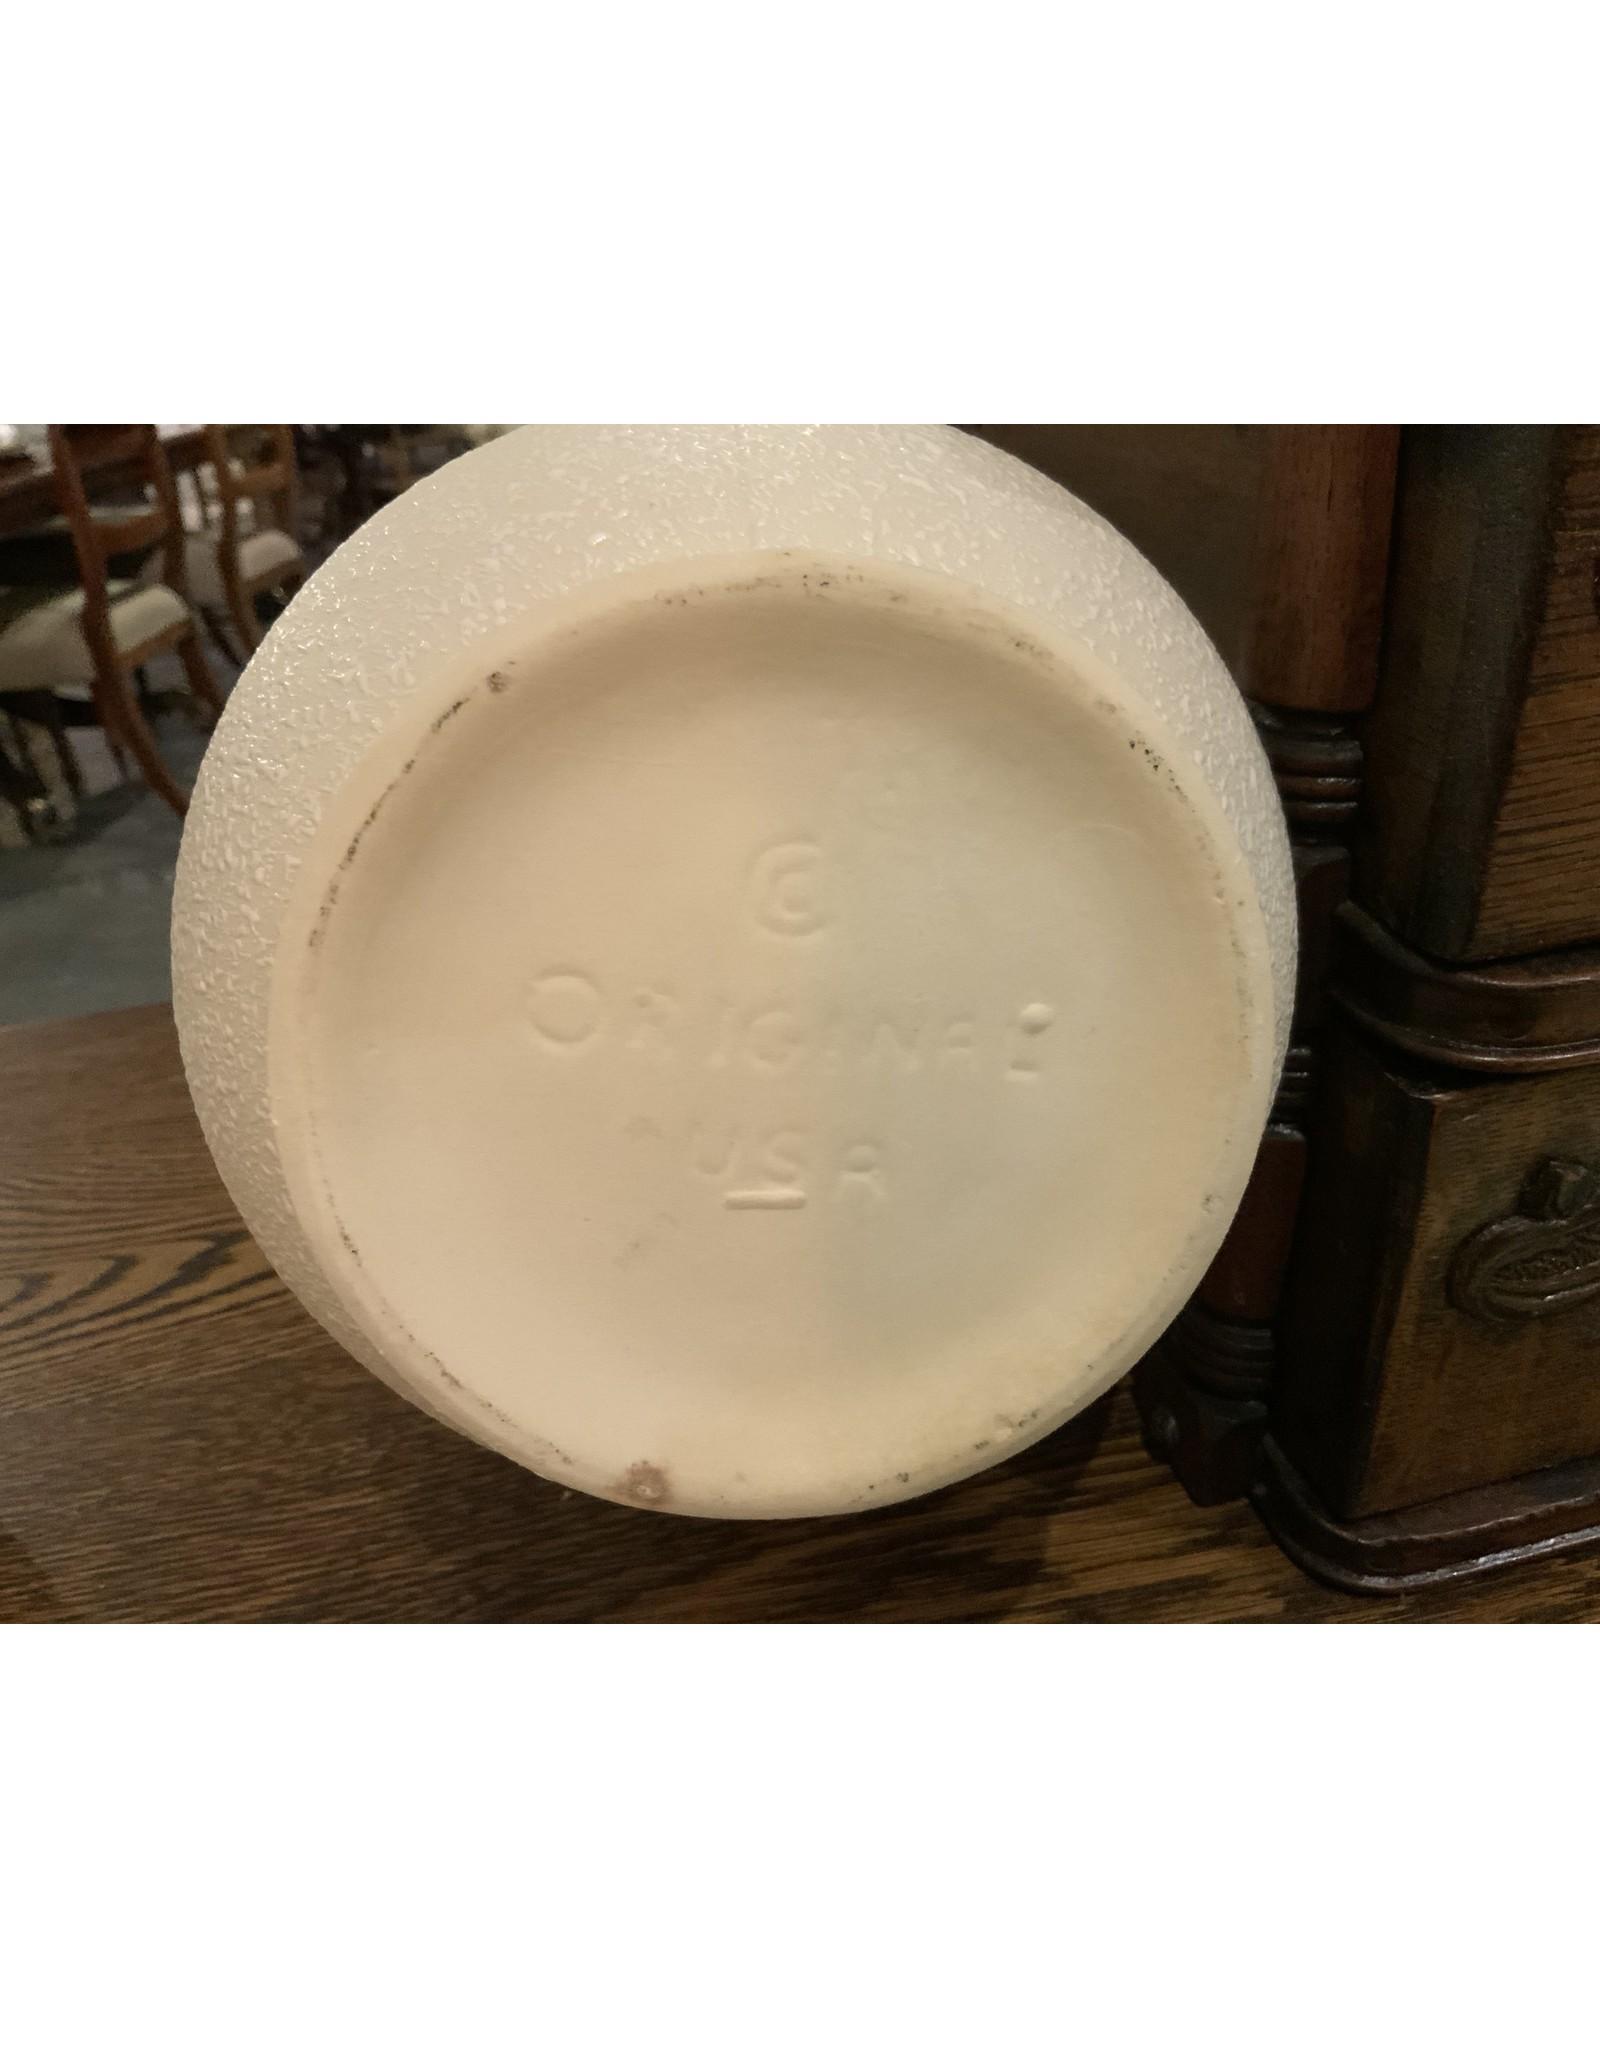 SPV California Pottery White Textured  Pitcher Vase